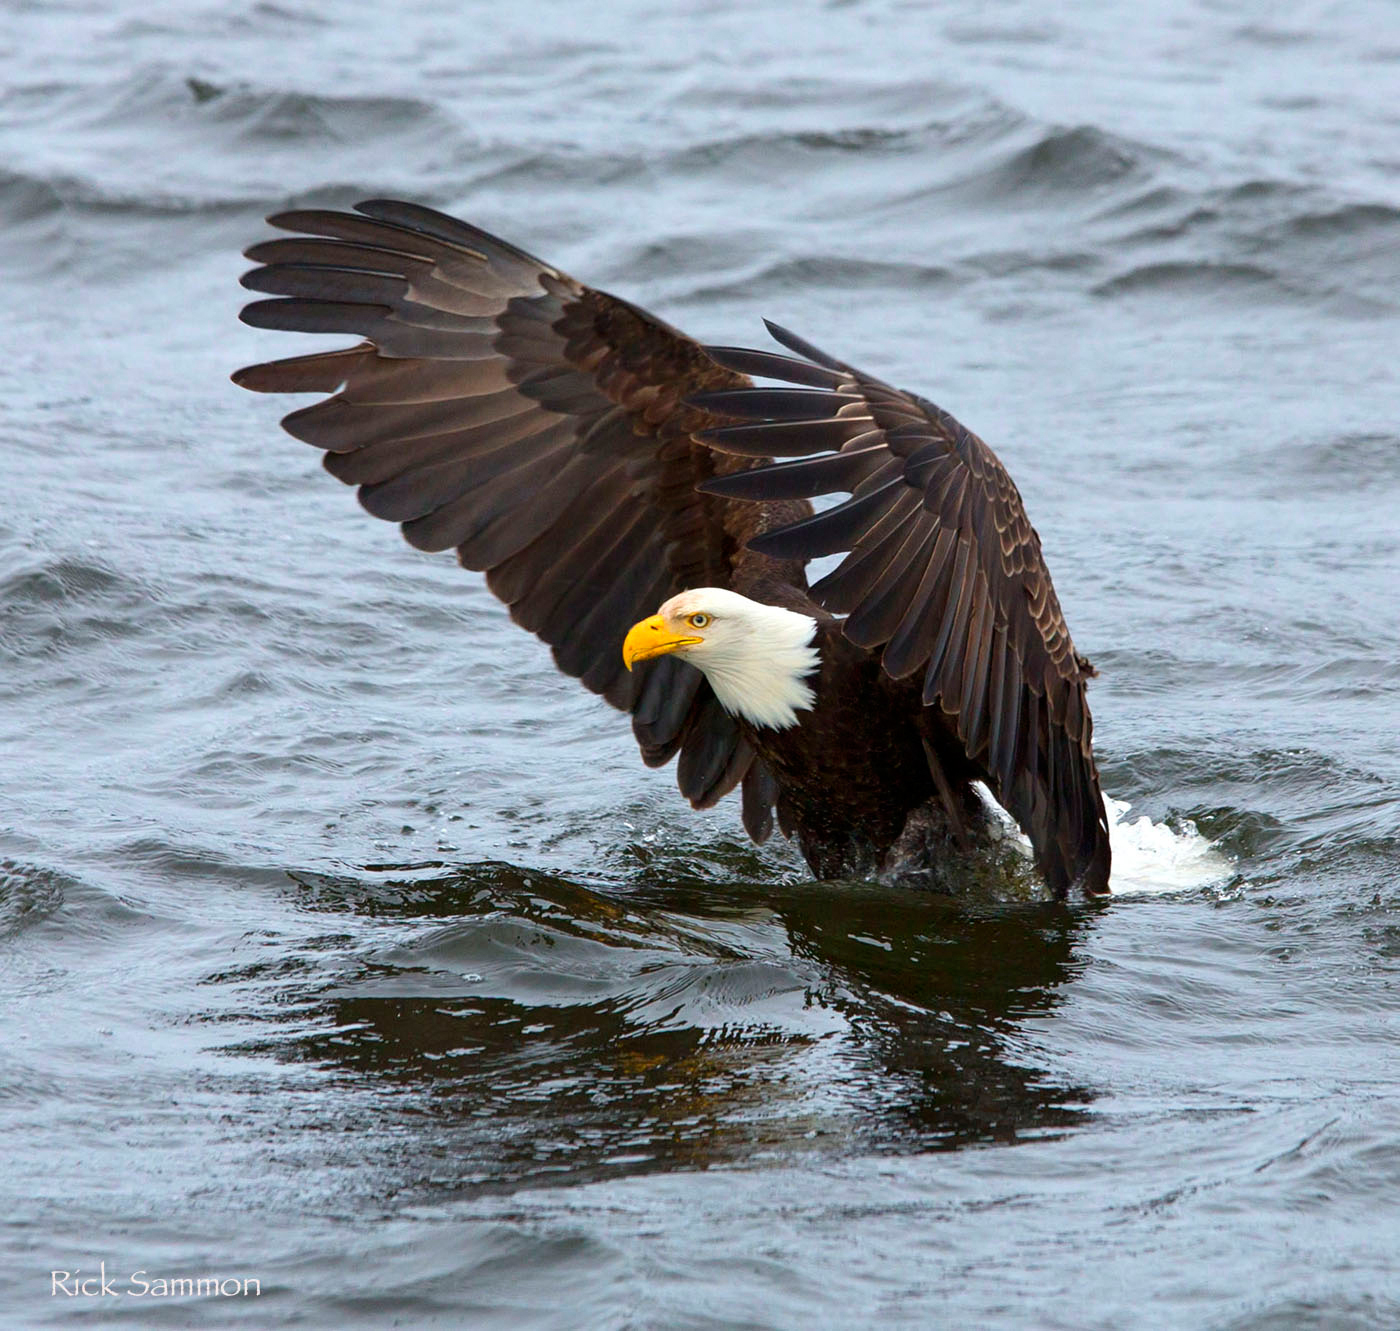 Rick Sammon's Birds040.jpg